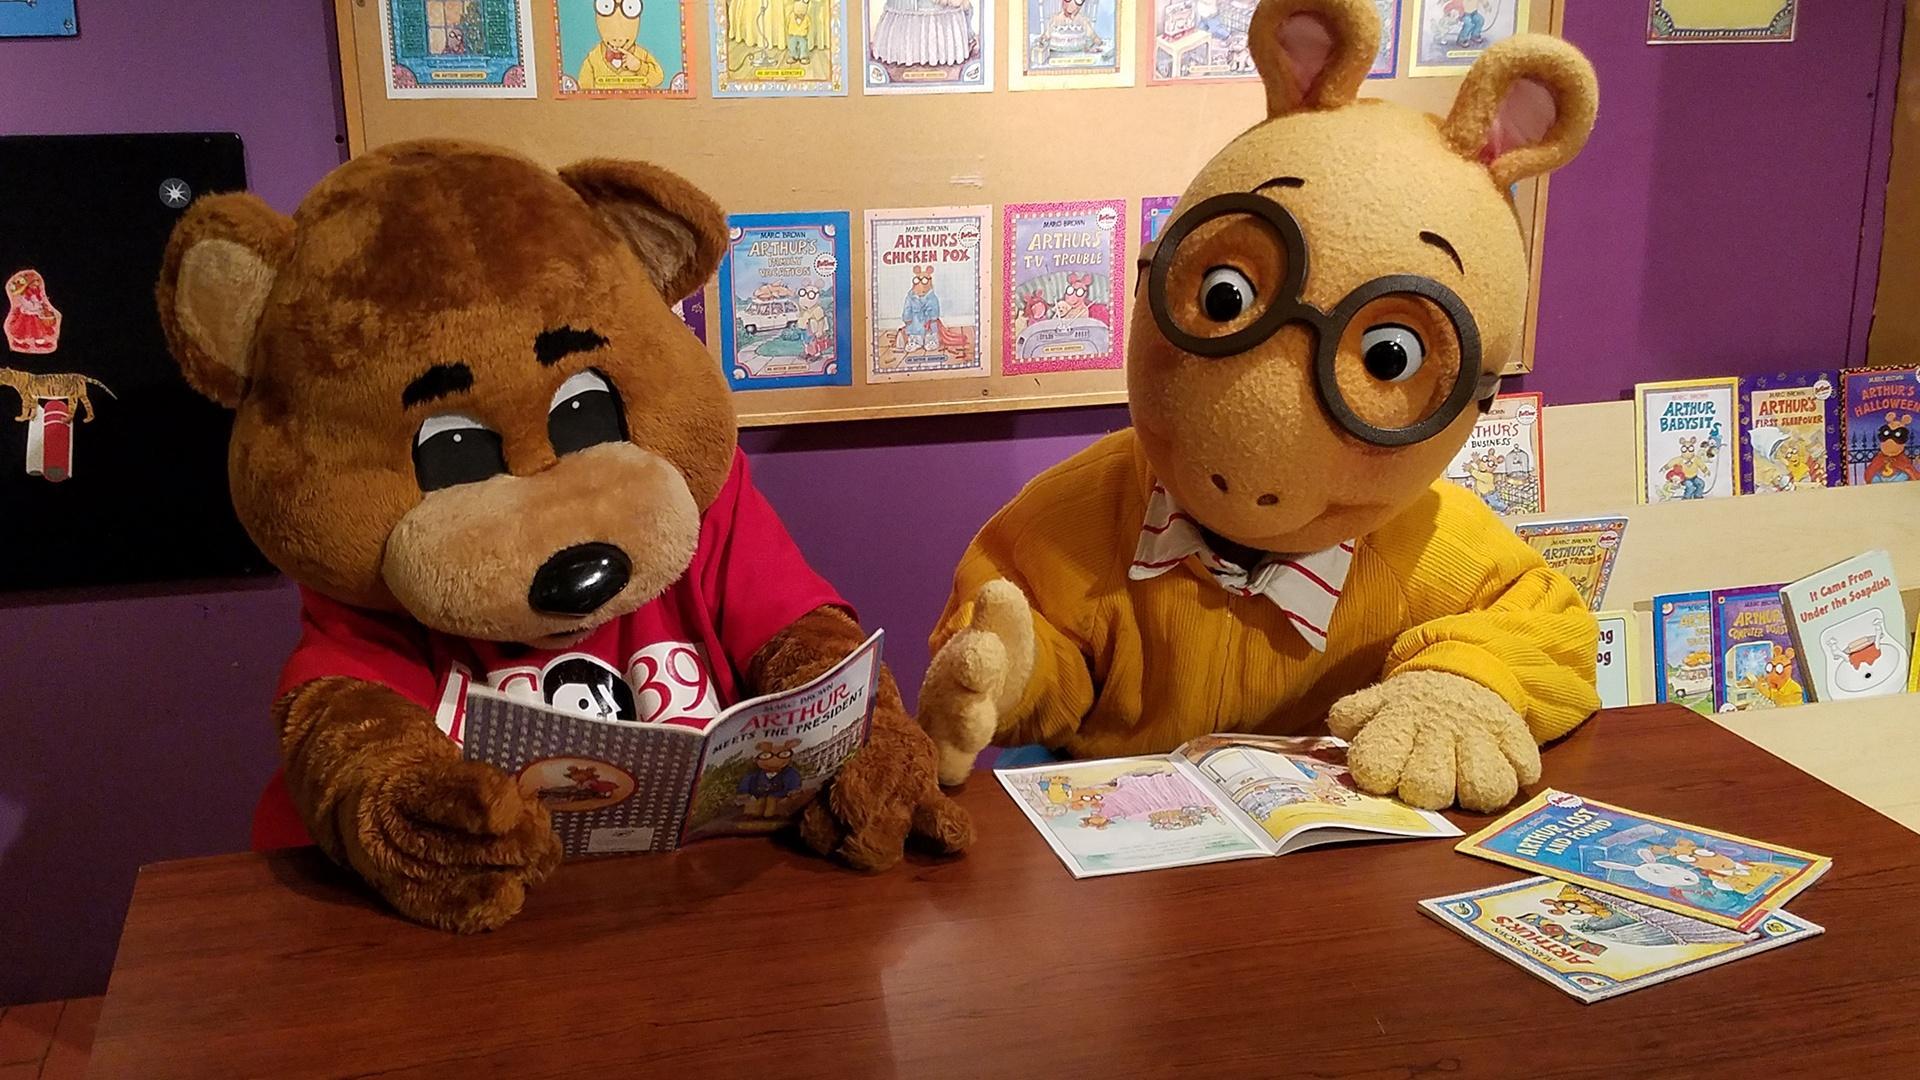 TeleBear and Arthur read a book together